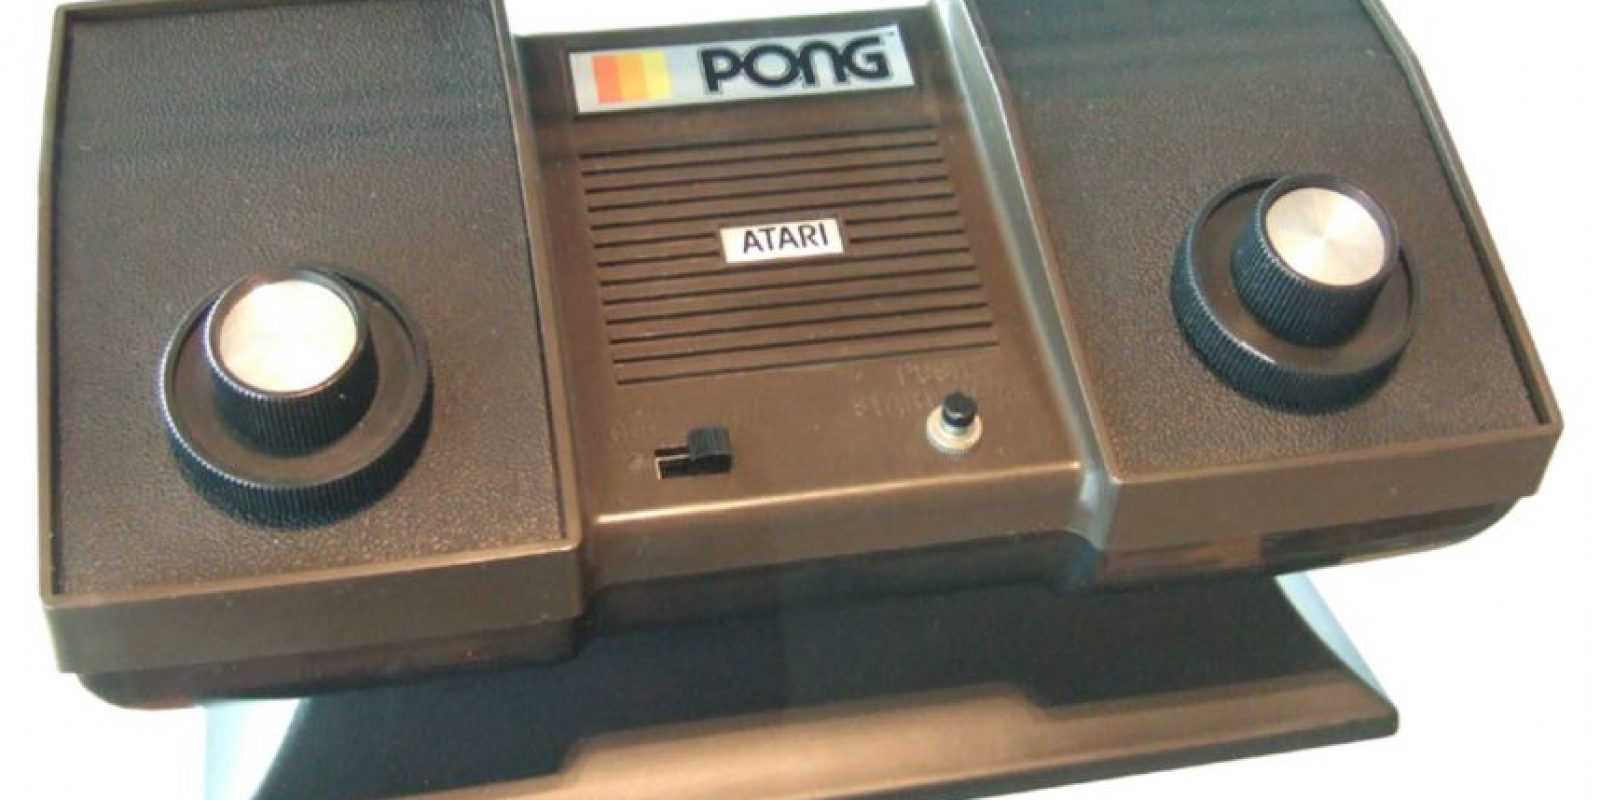 Su creación: Pong, de Atari Foto:Atari